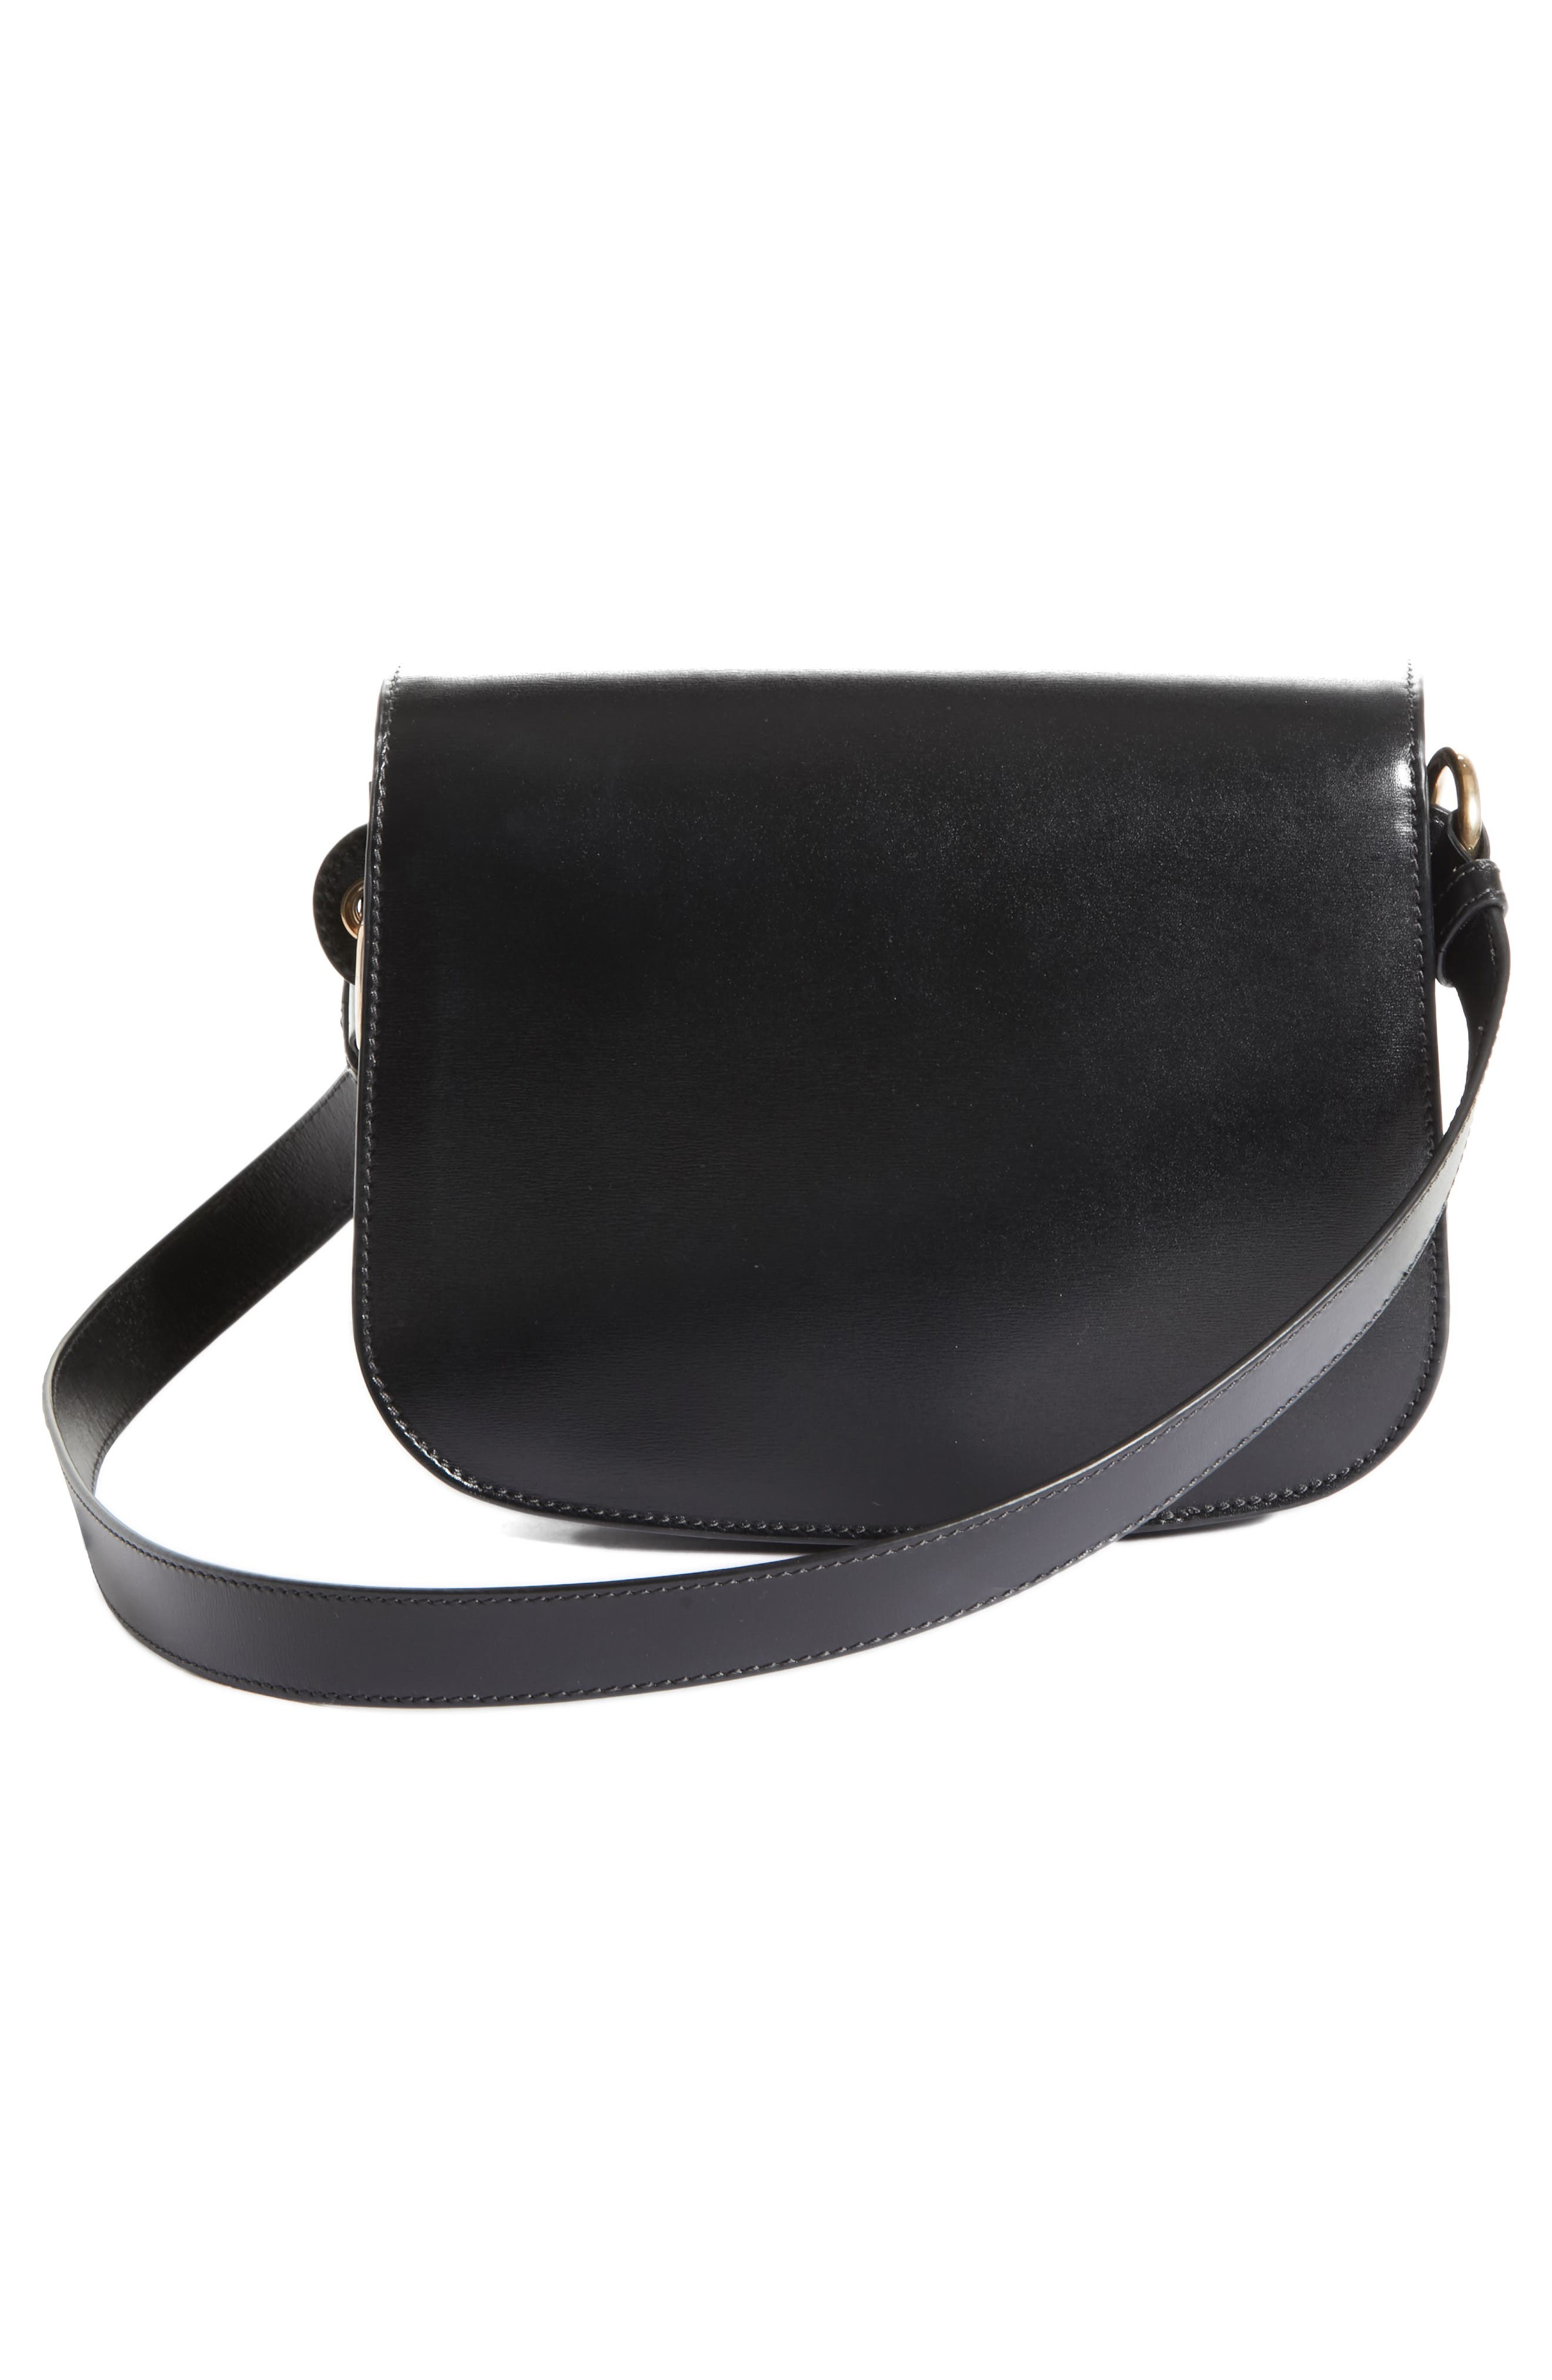 CALVIN KLEIN 209W39NYC Small Round Lock Shoulder Bag,                             Alternate thumbnail 3, color,                             BLACK